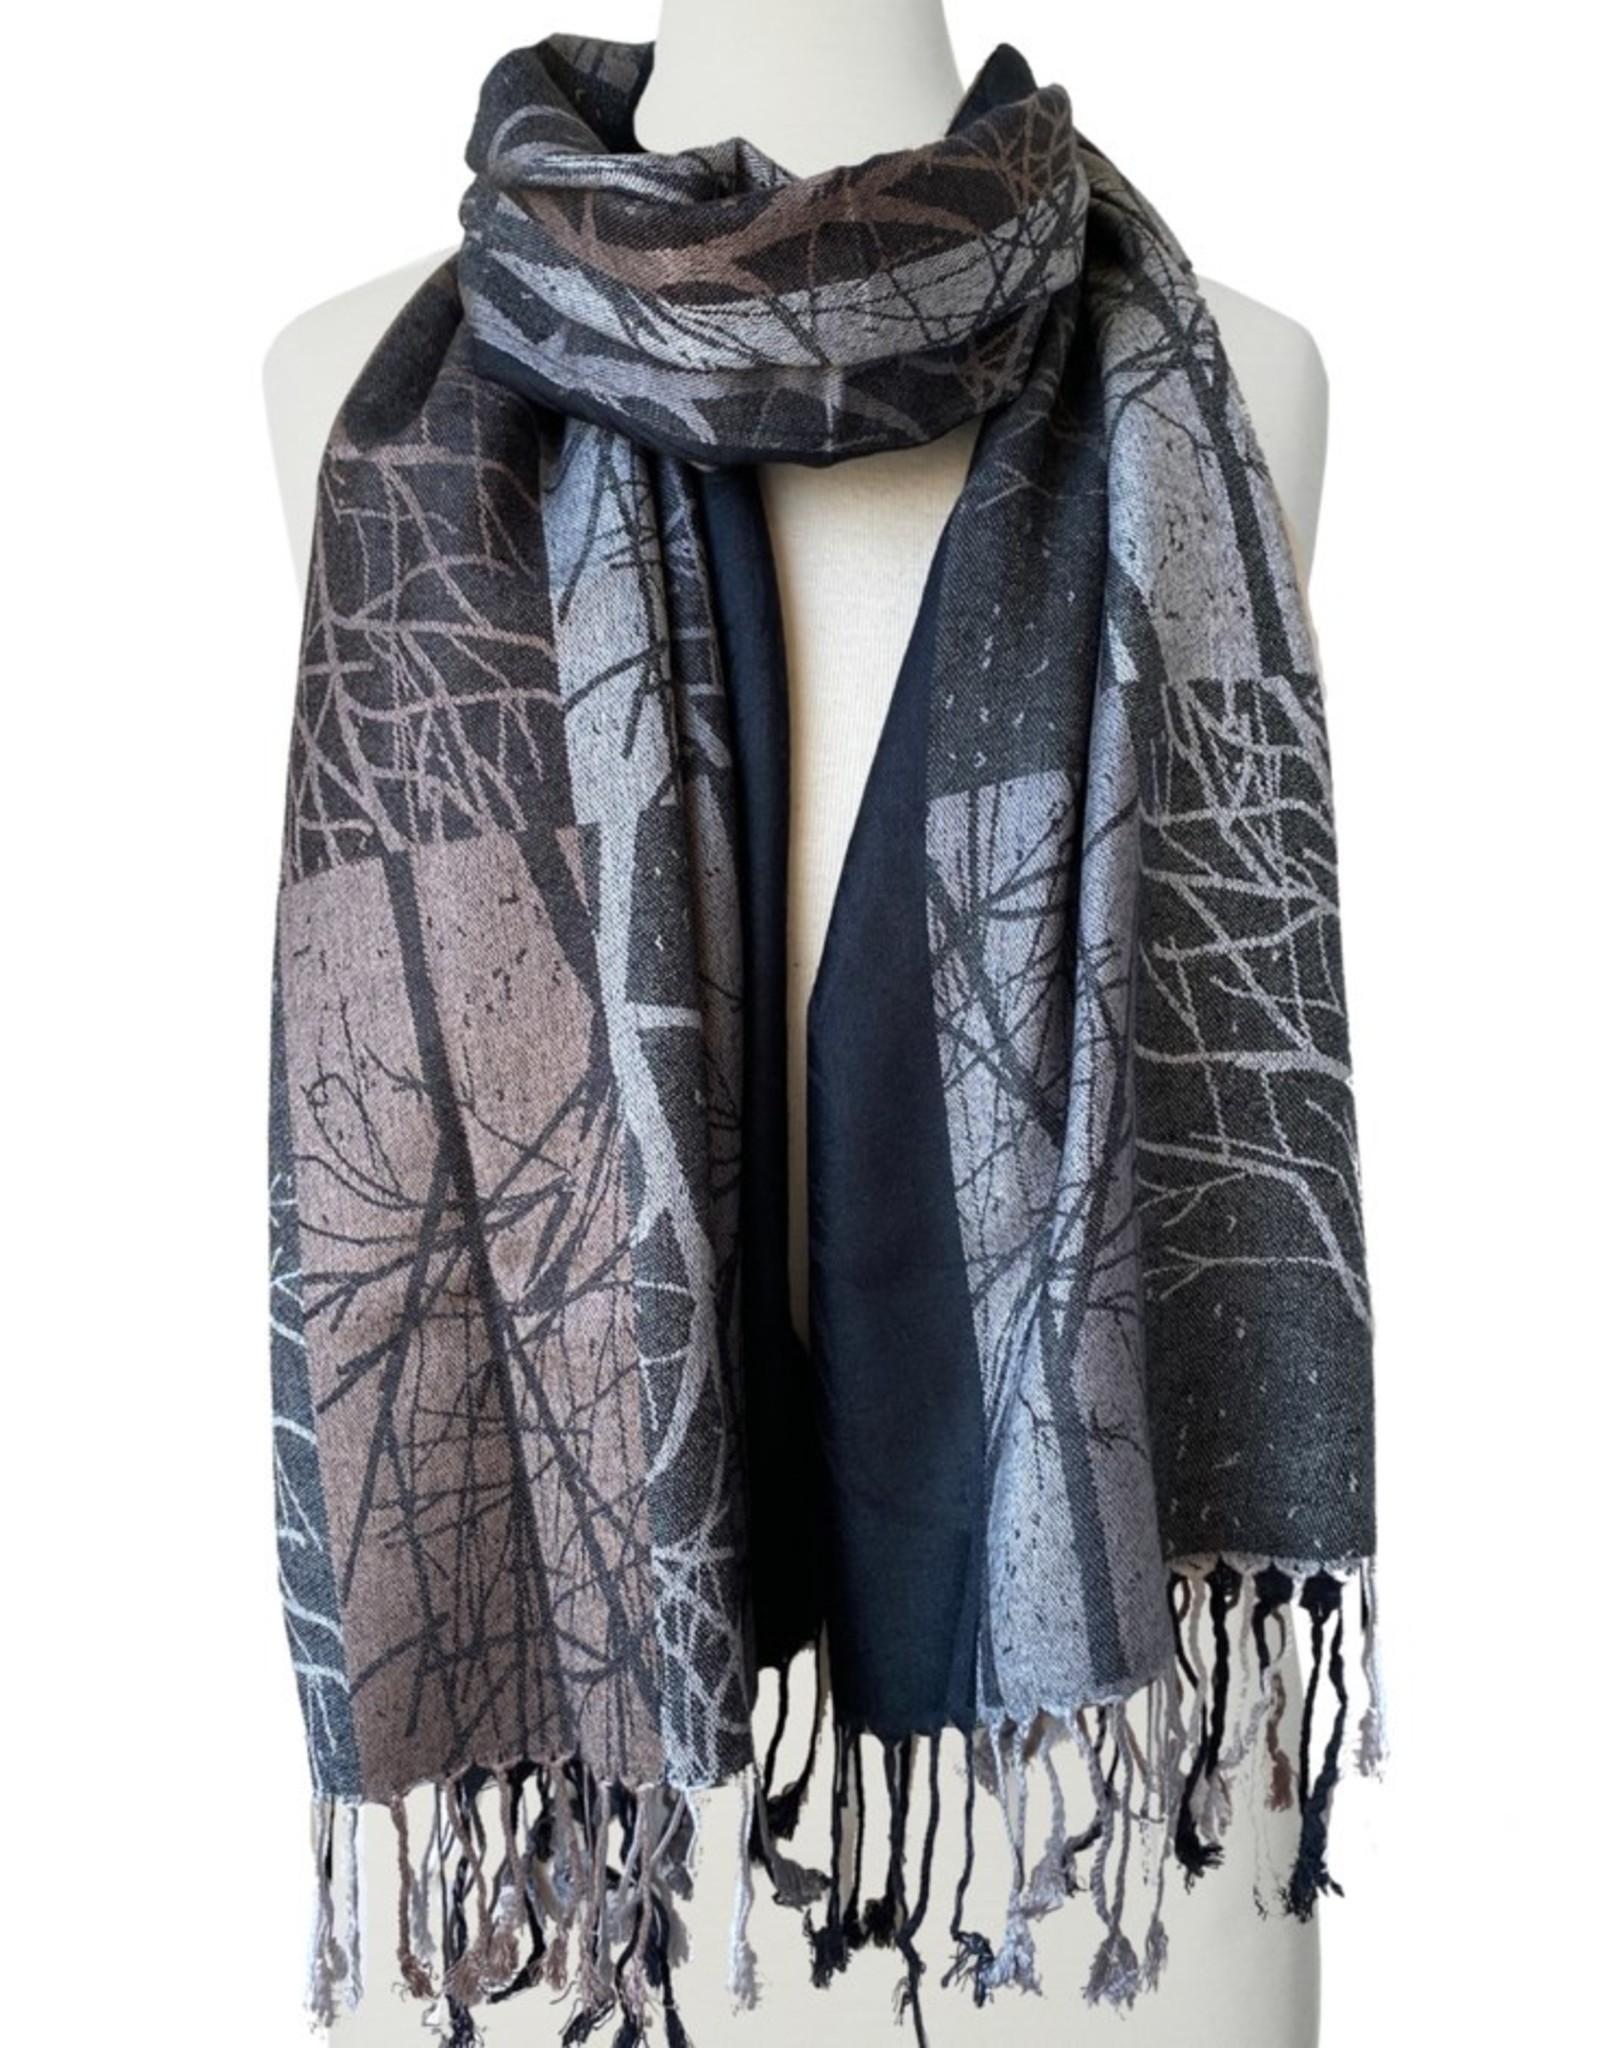 Tree Printed Silky Scarf-black